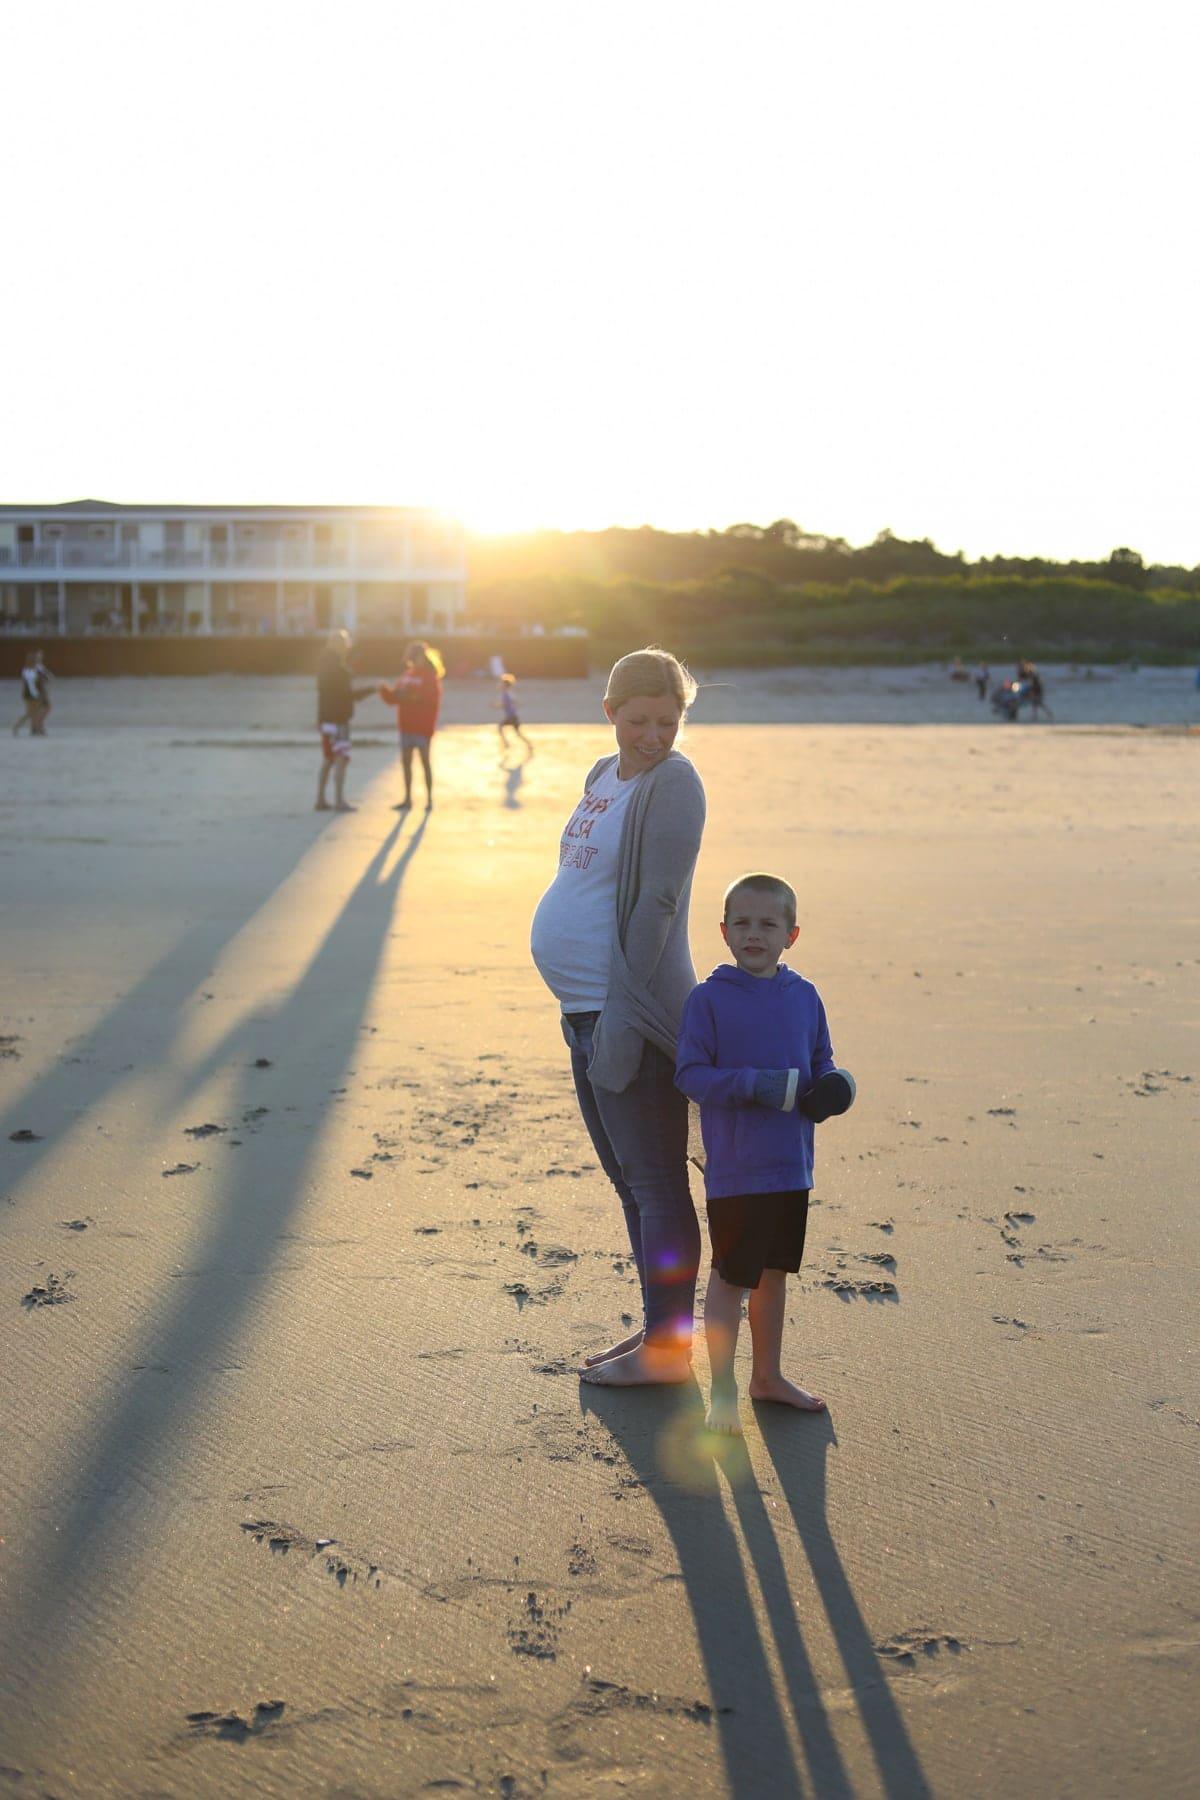 Lauren and Blake at the beach